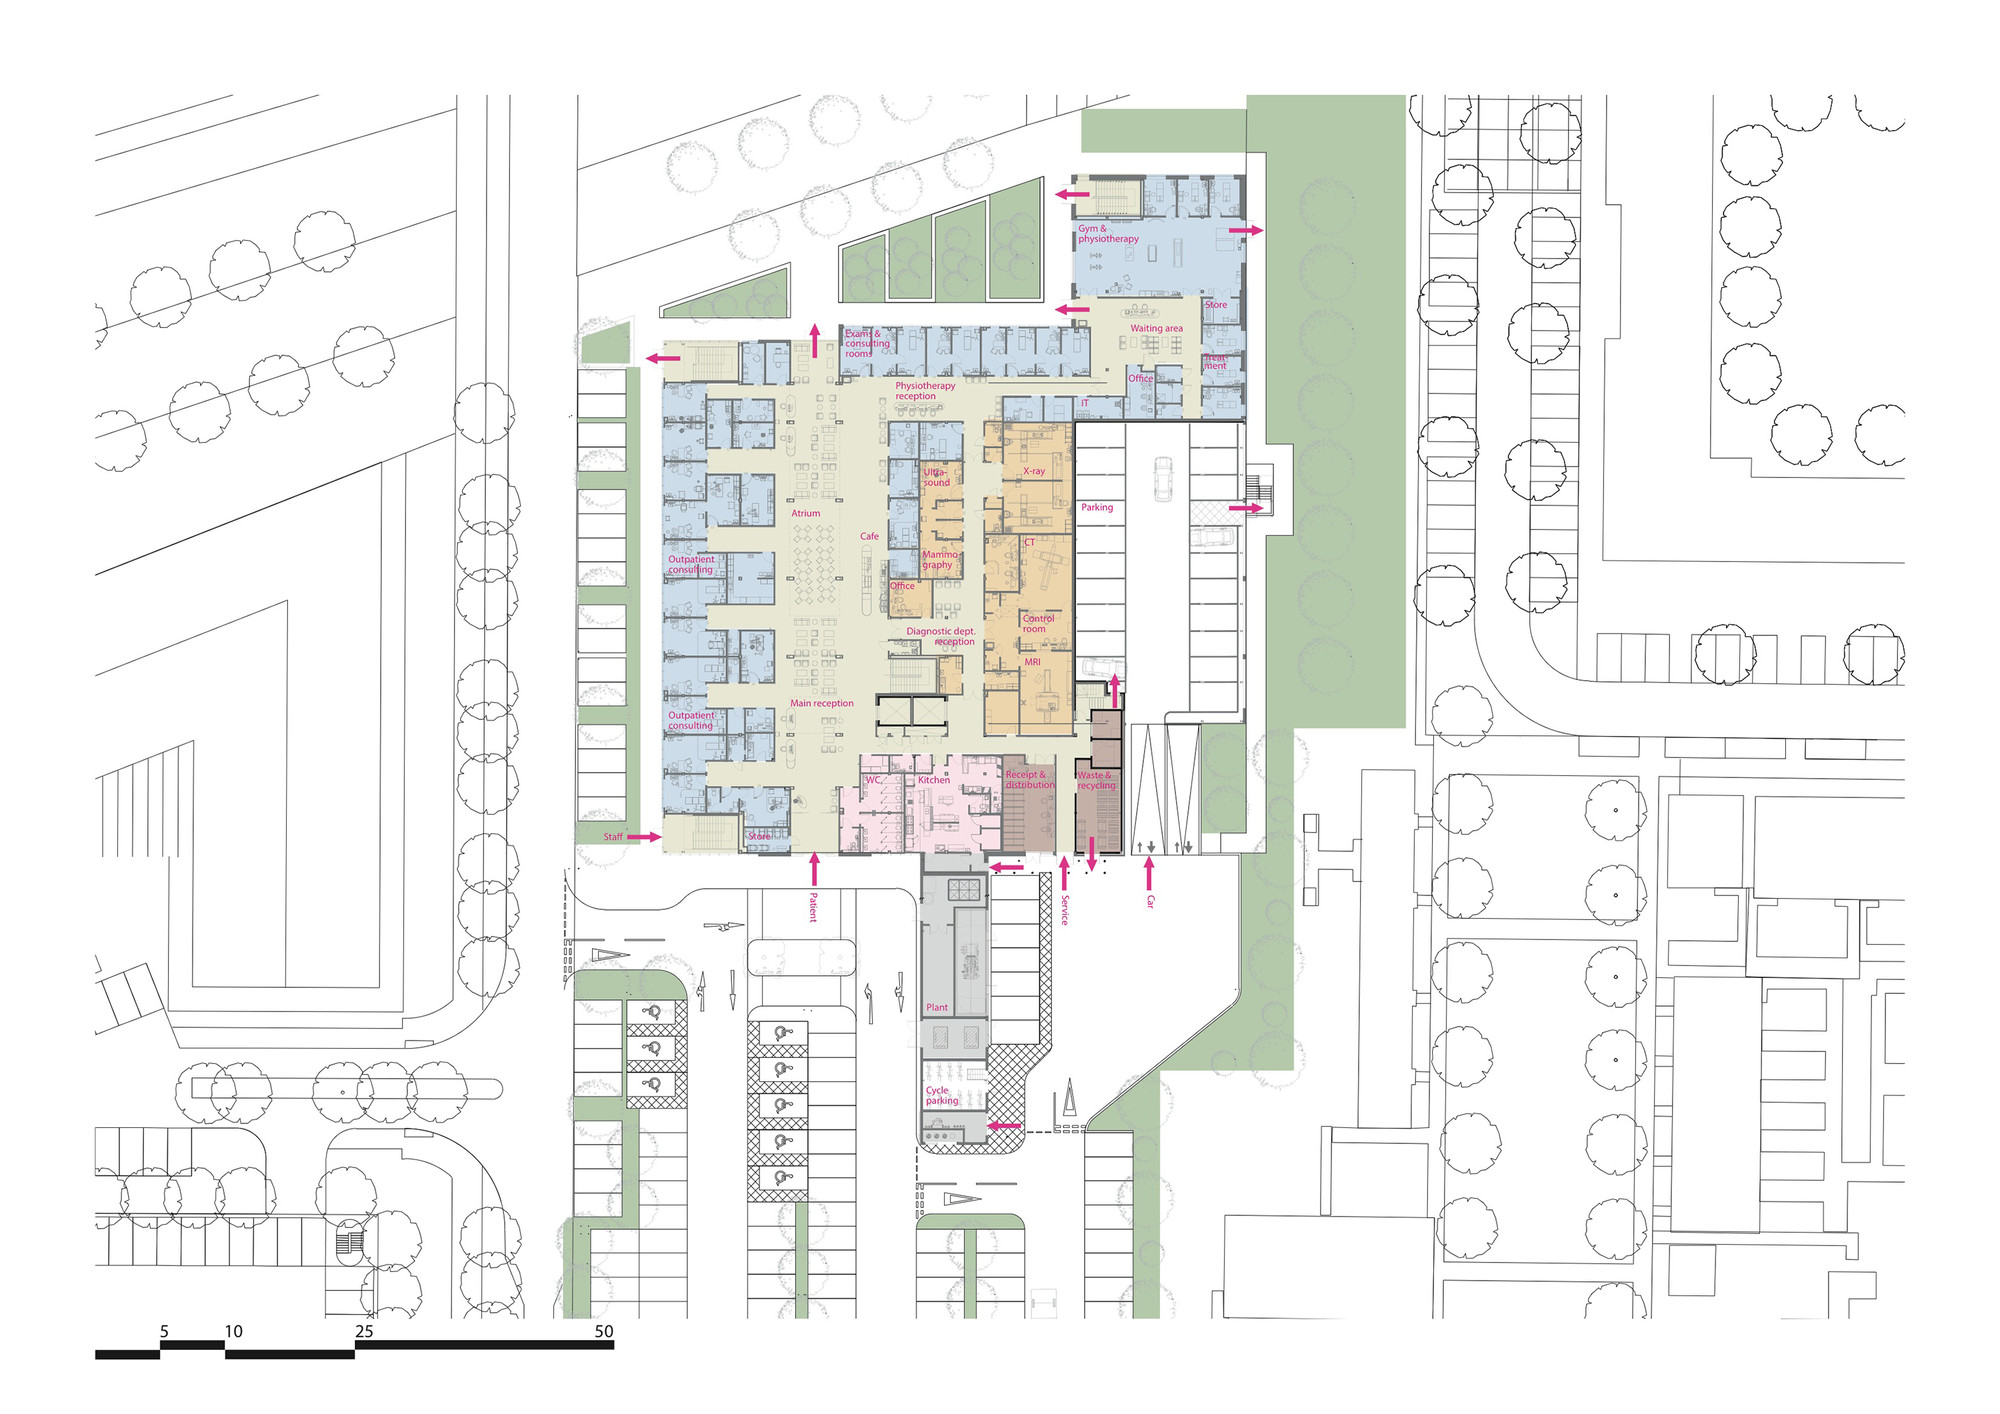 hight resolution of circle reading hospital brydenwood ground floor plan